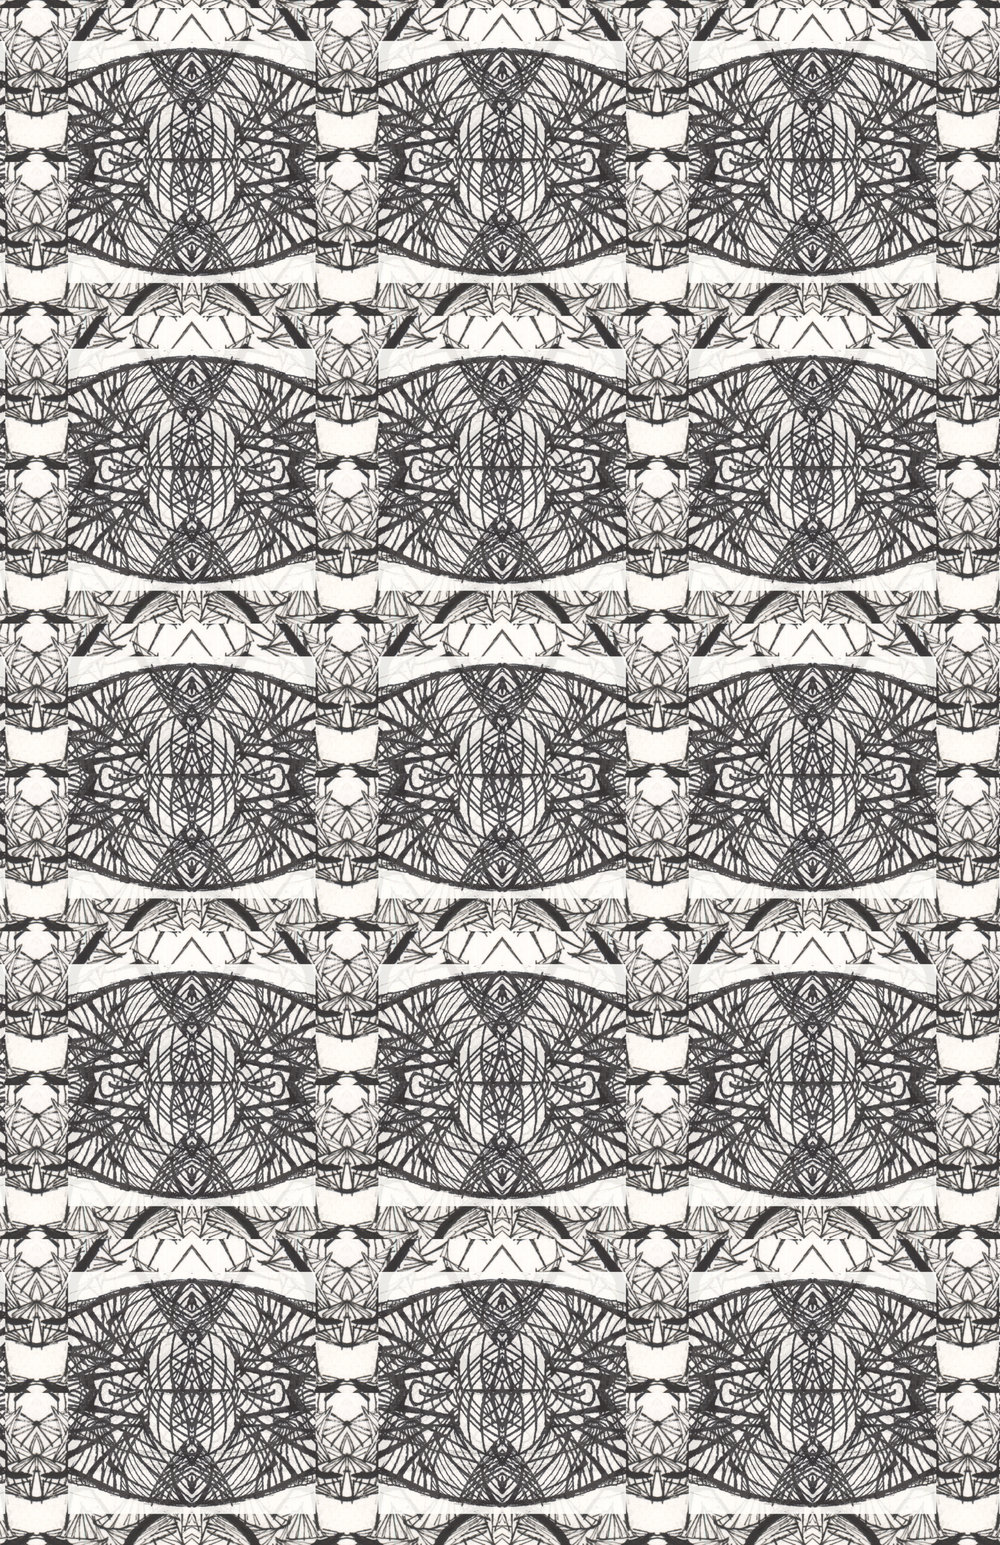 pattern5R-2.jpg